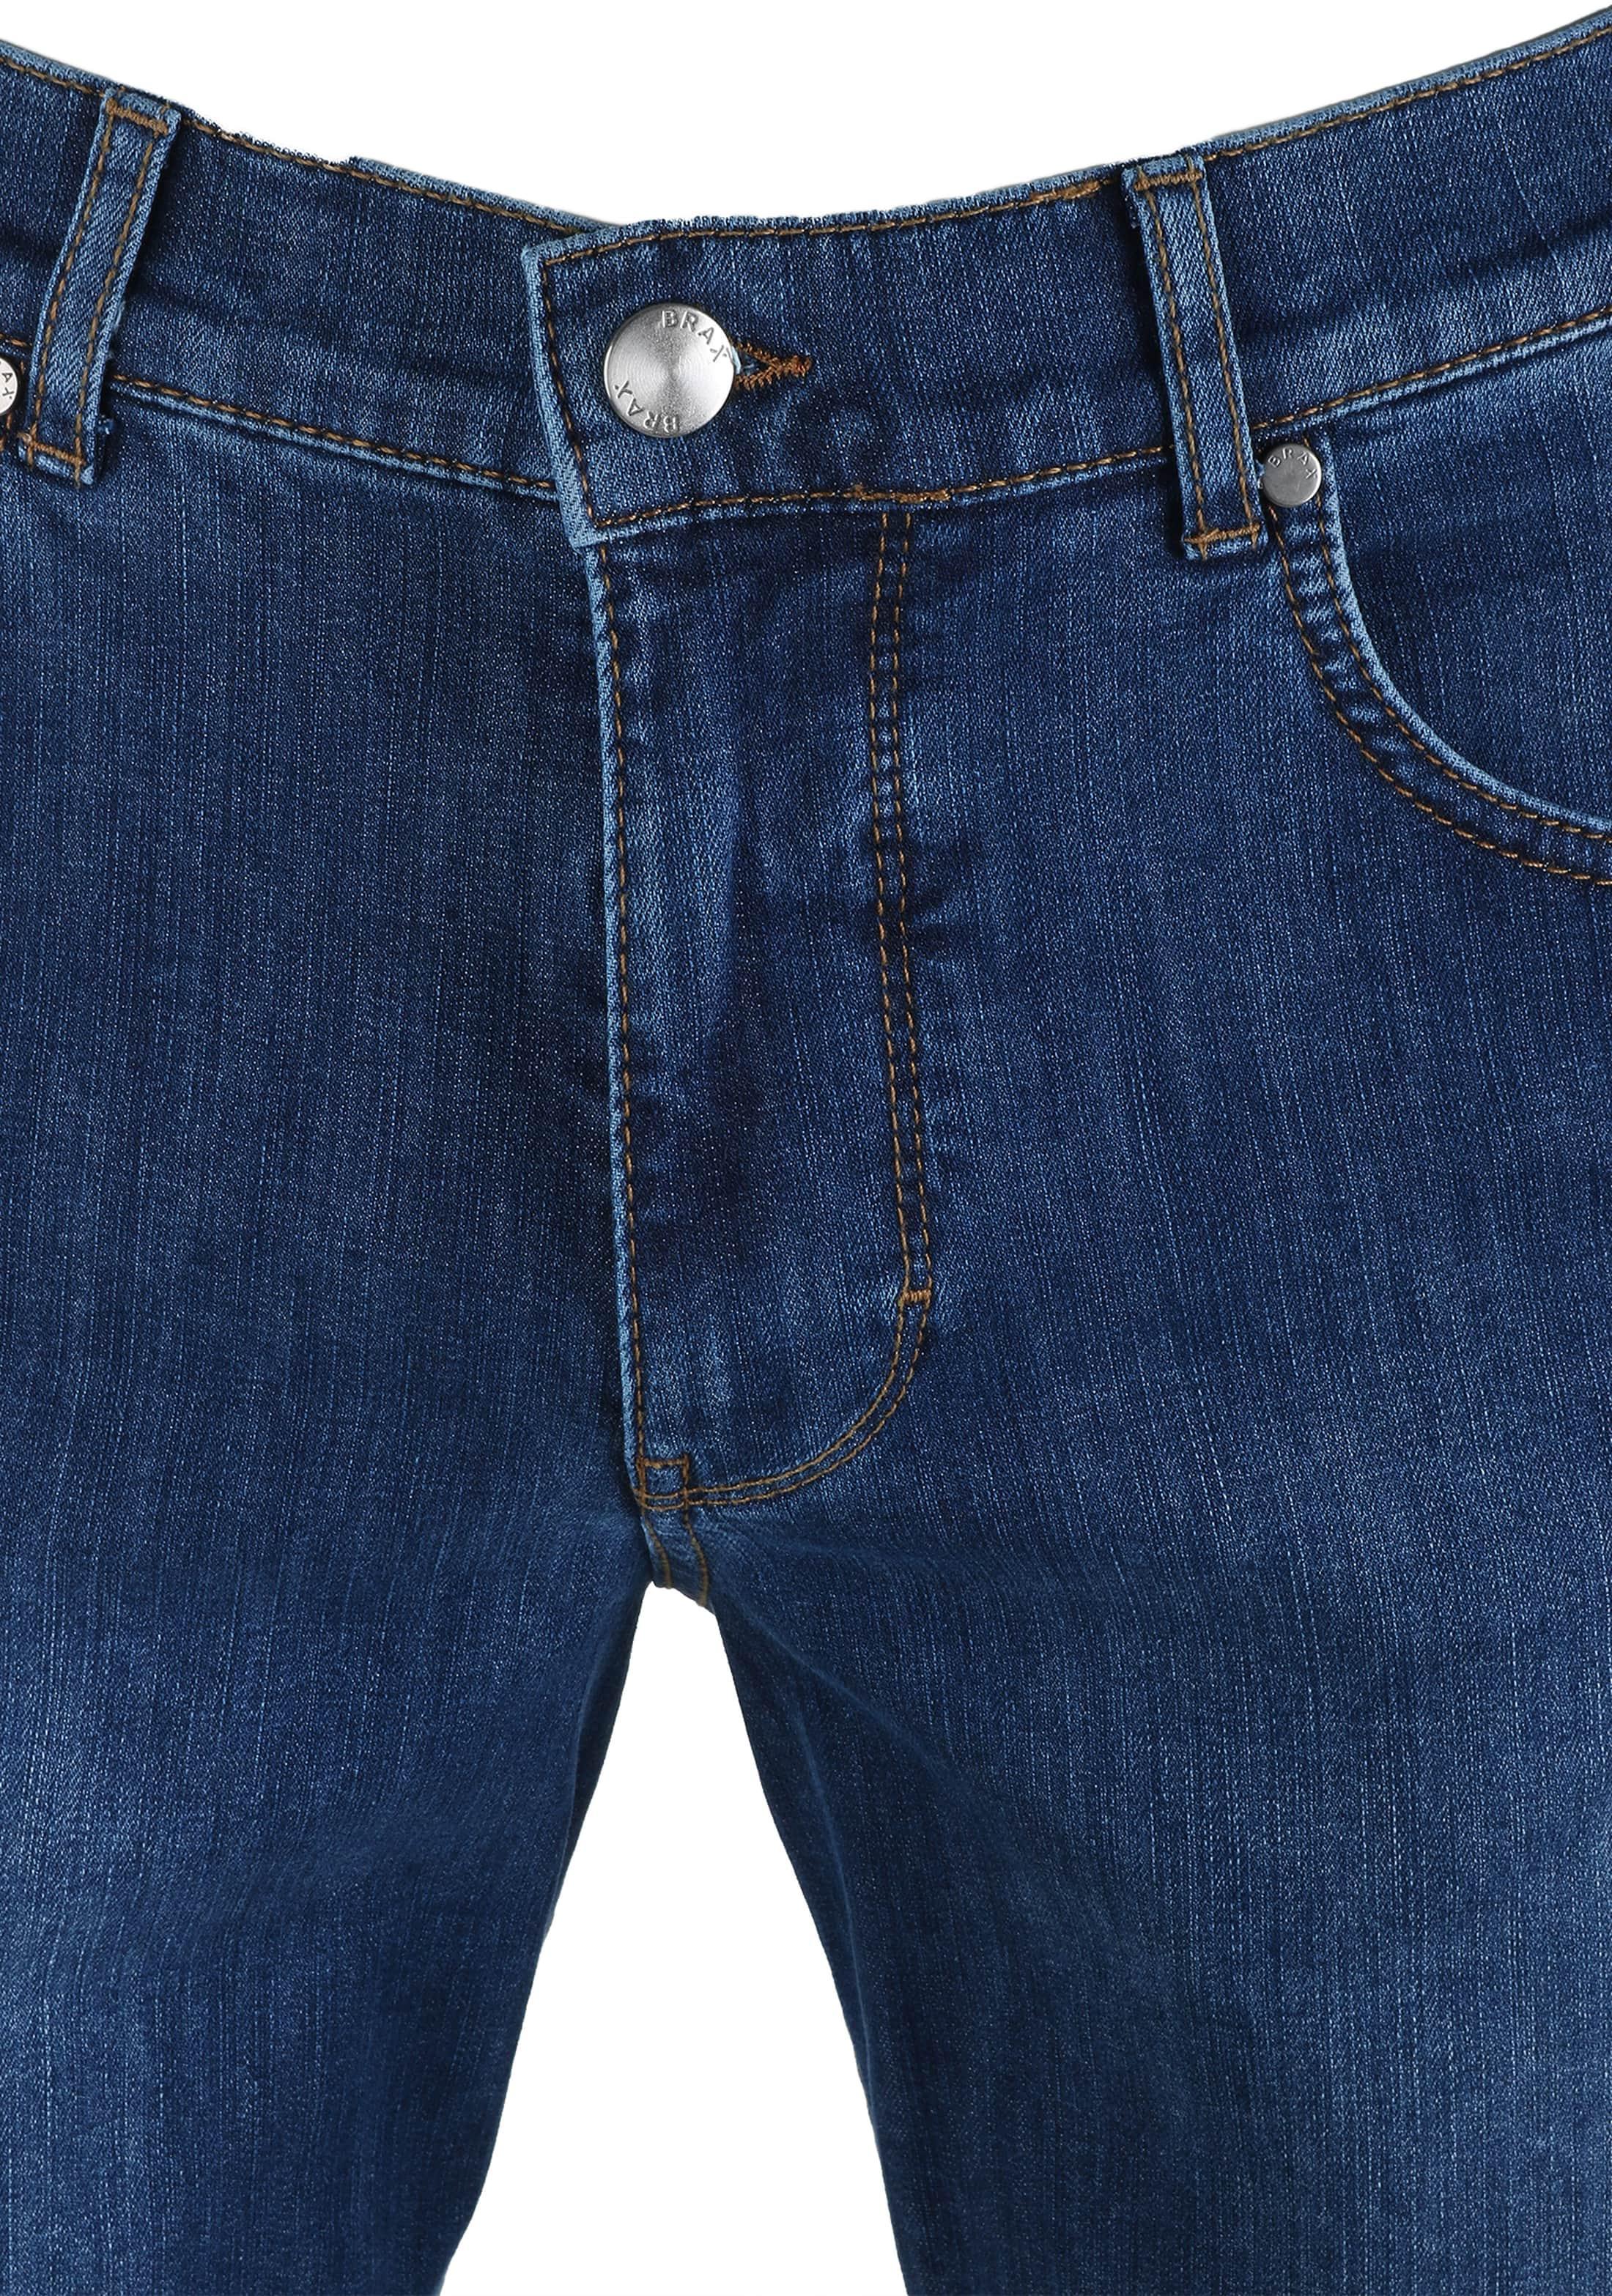 Brax Cooper Denim Jeans Blue Five Pocket foto 2